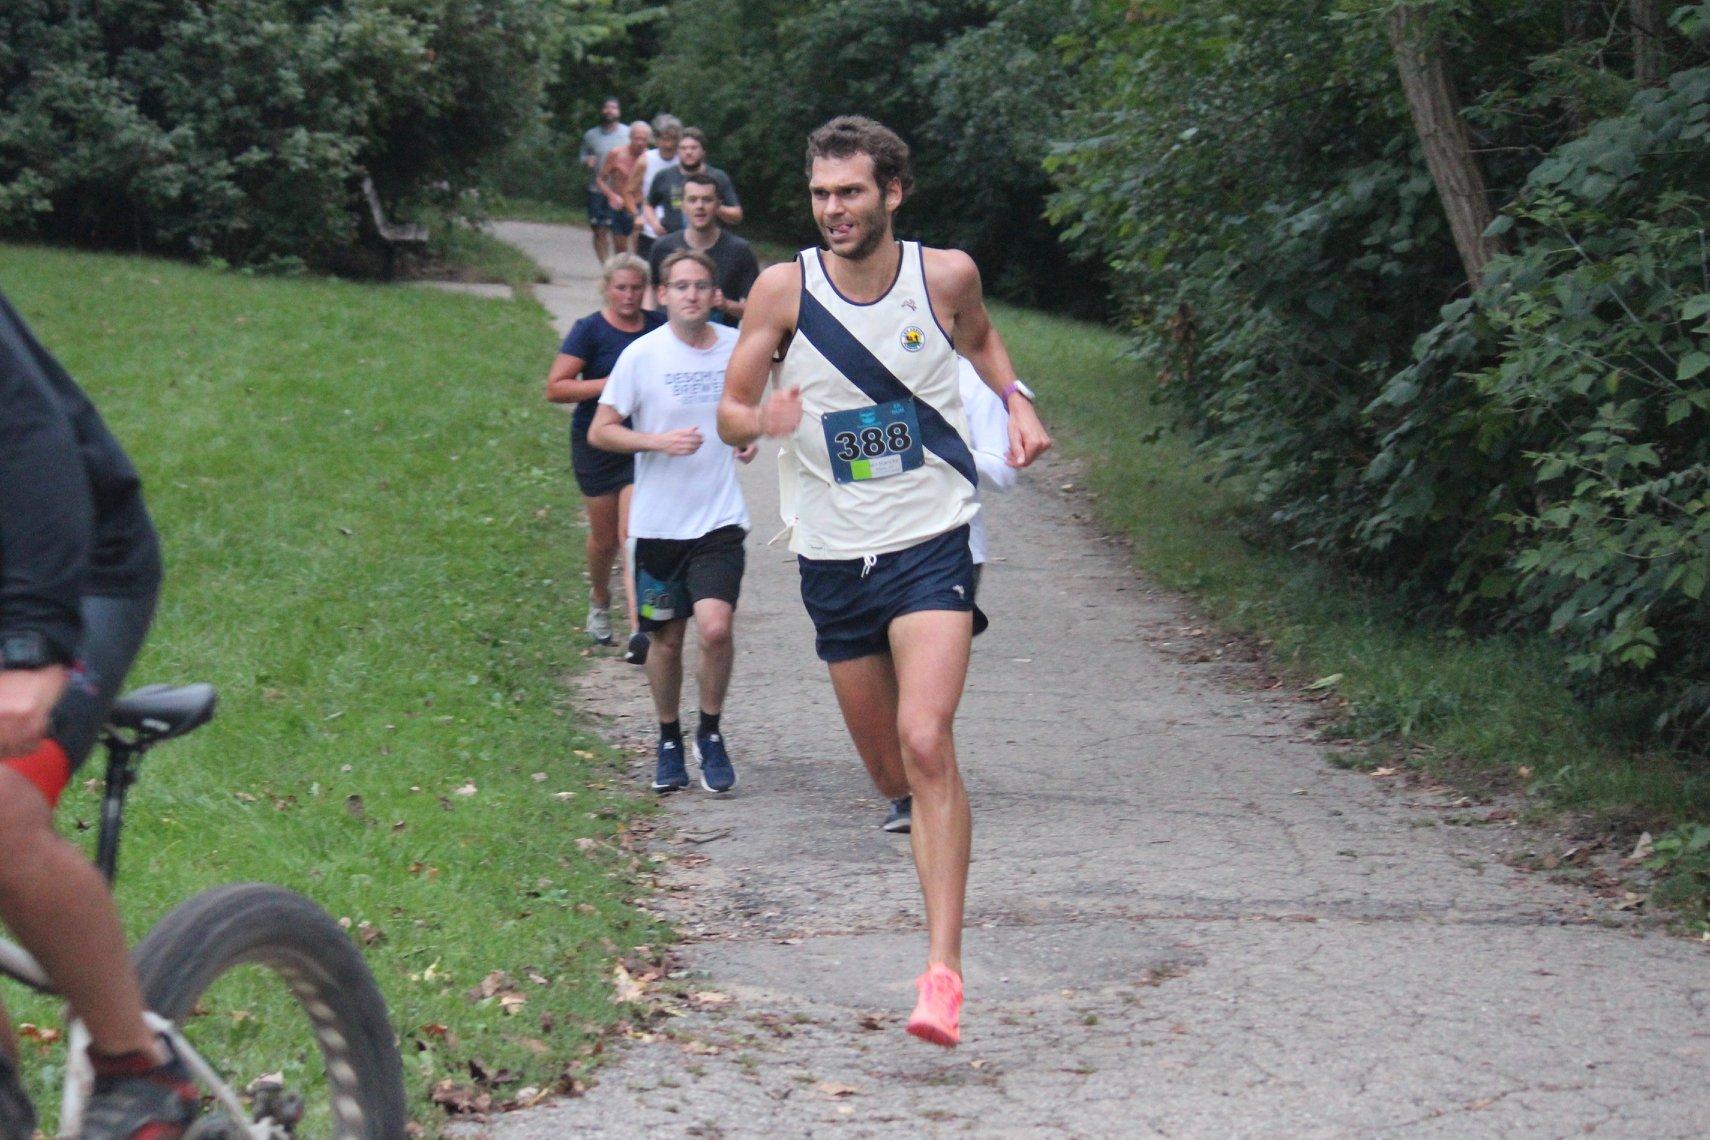 Ian Hancke sets a Gallup Gallop 5K record- 15:45 (5:05 pace)